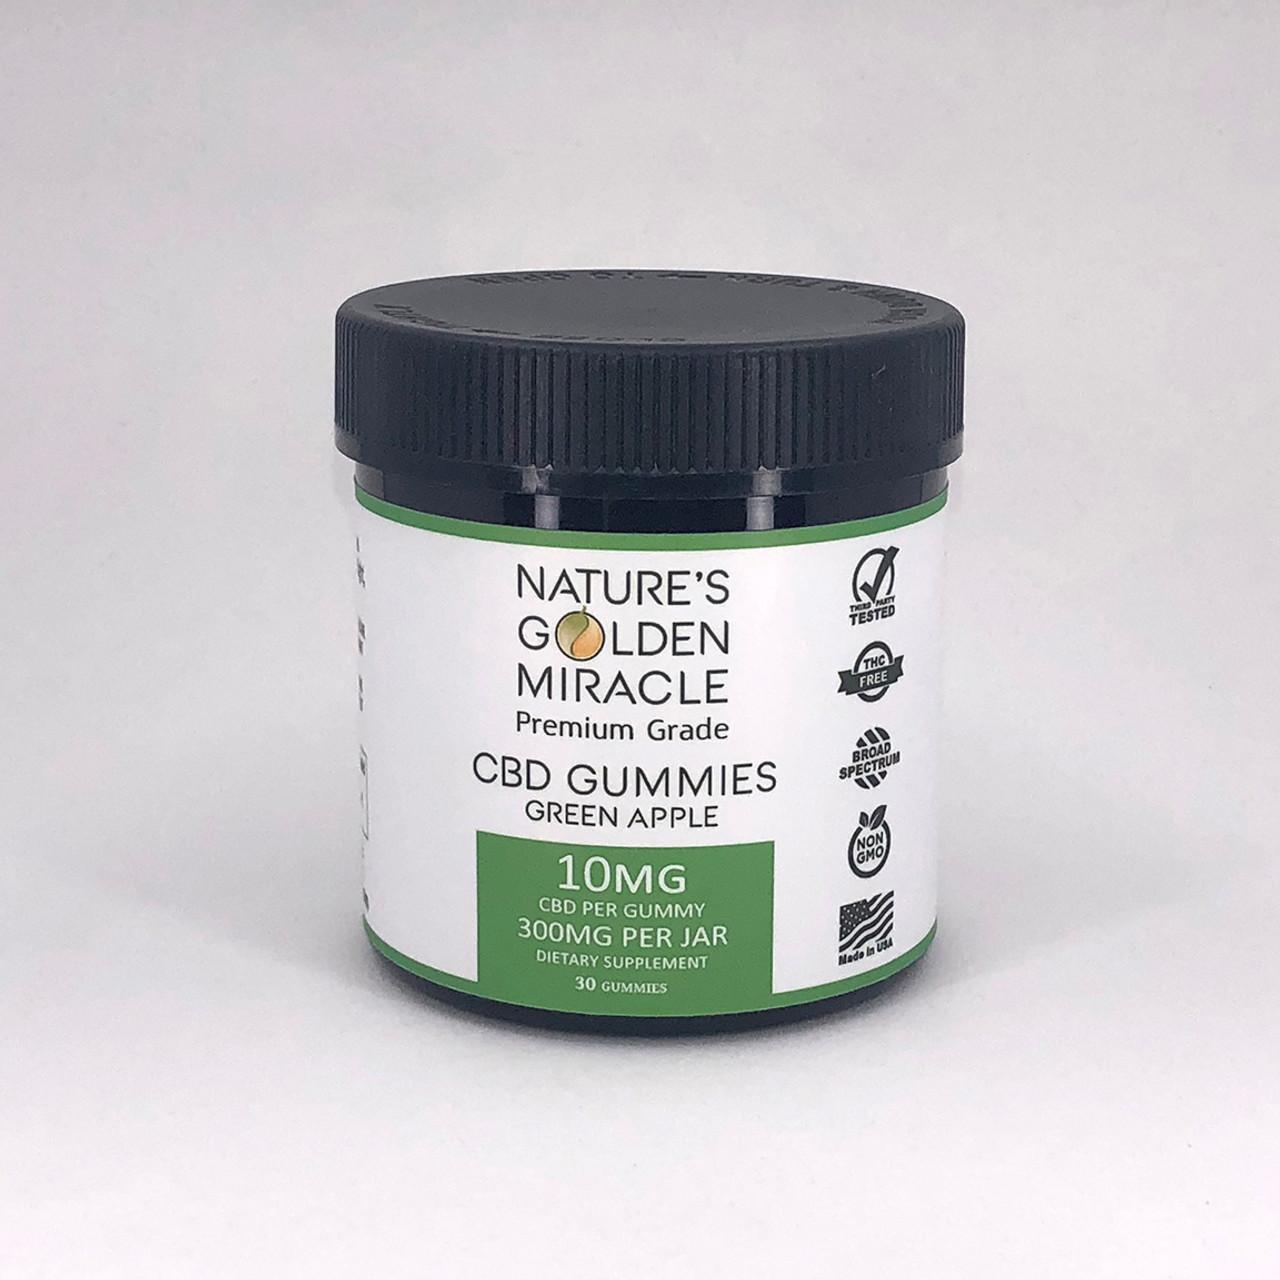 Nature's Golden Miracle premium grade THC-free green apple CBD Gummies